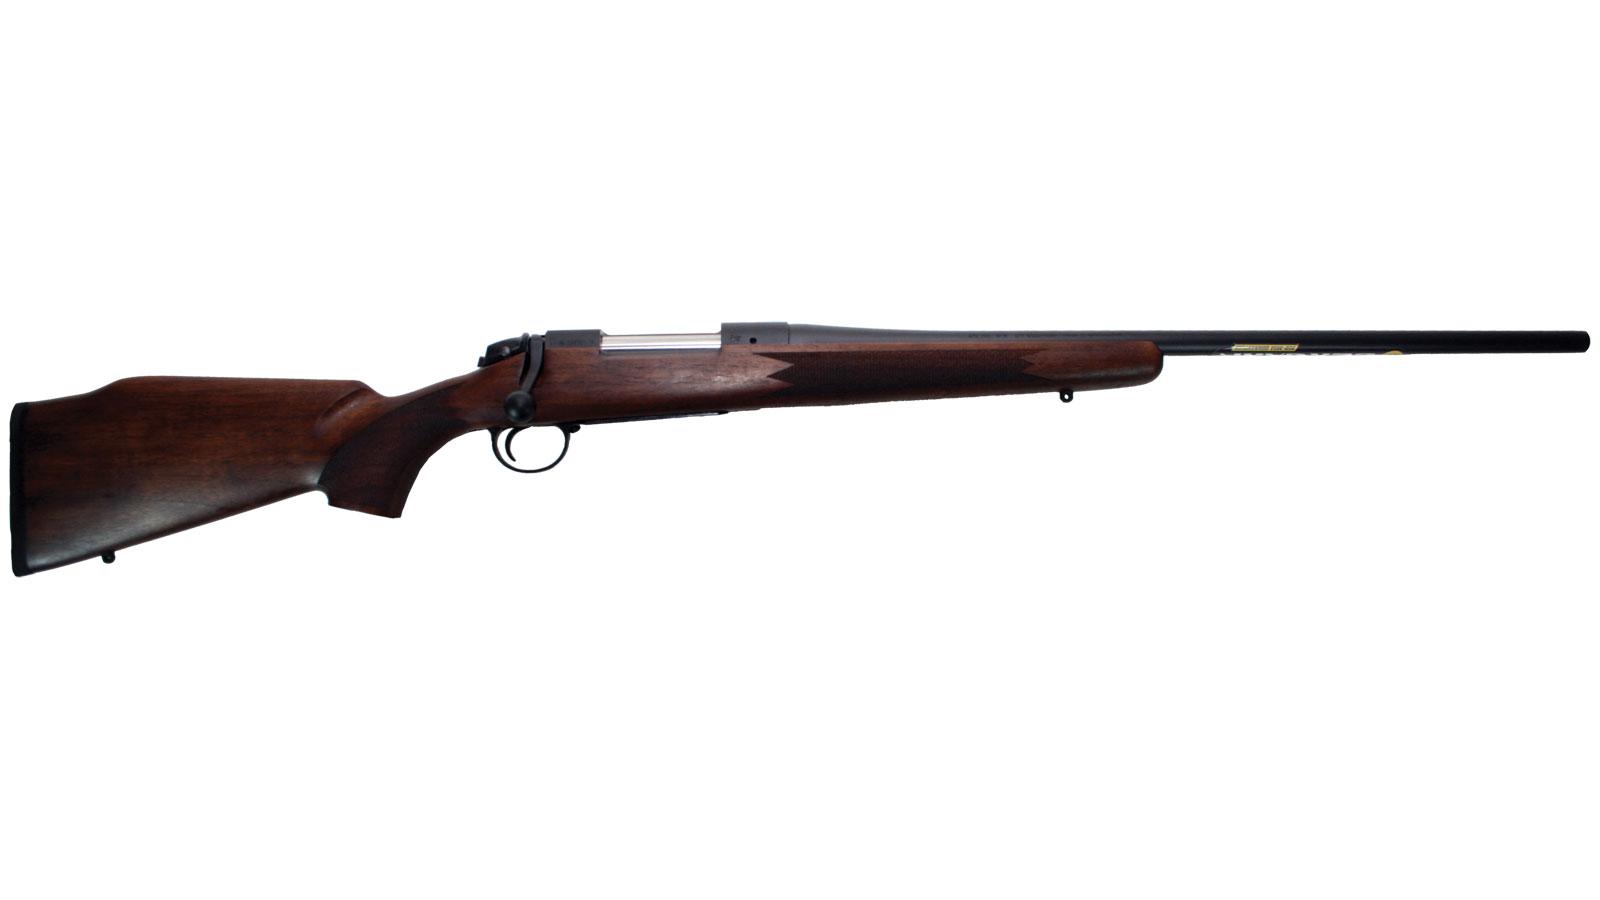 Bergara Rifles B14S001 B-14 Timber Bolt 308 Winchester 22 4+1 Walnut Stock Blued in.